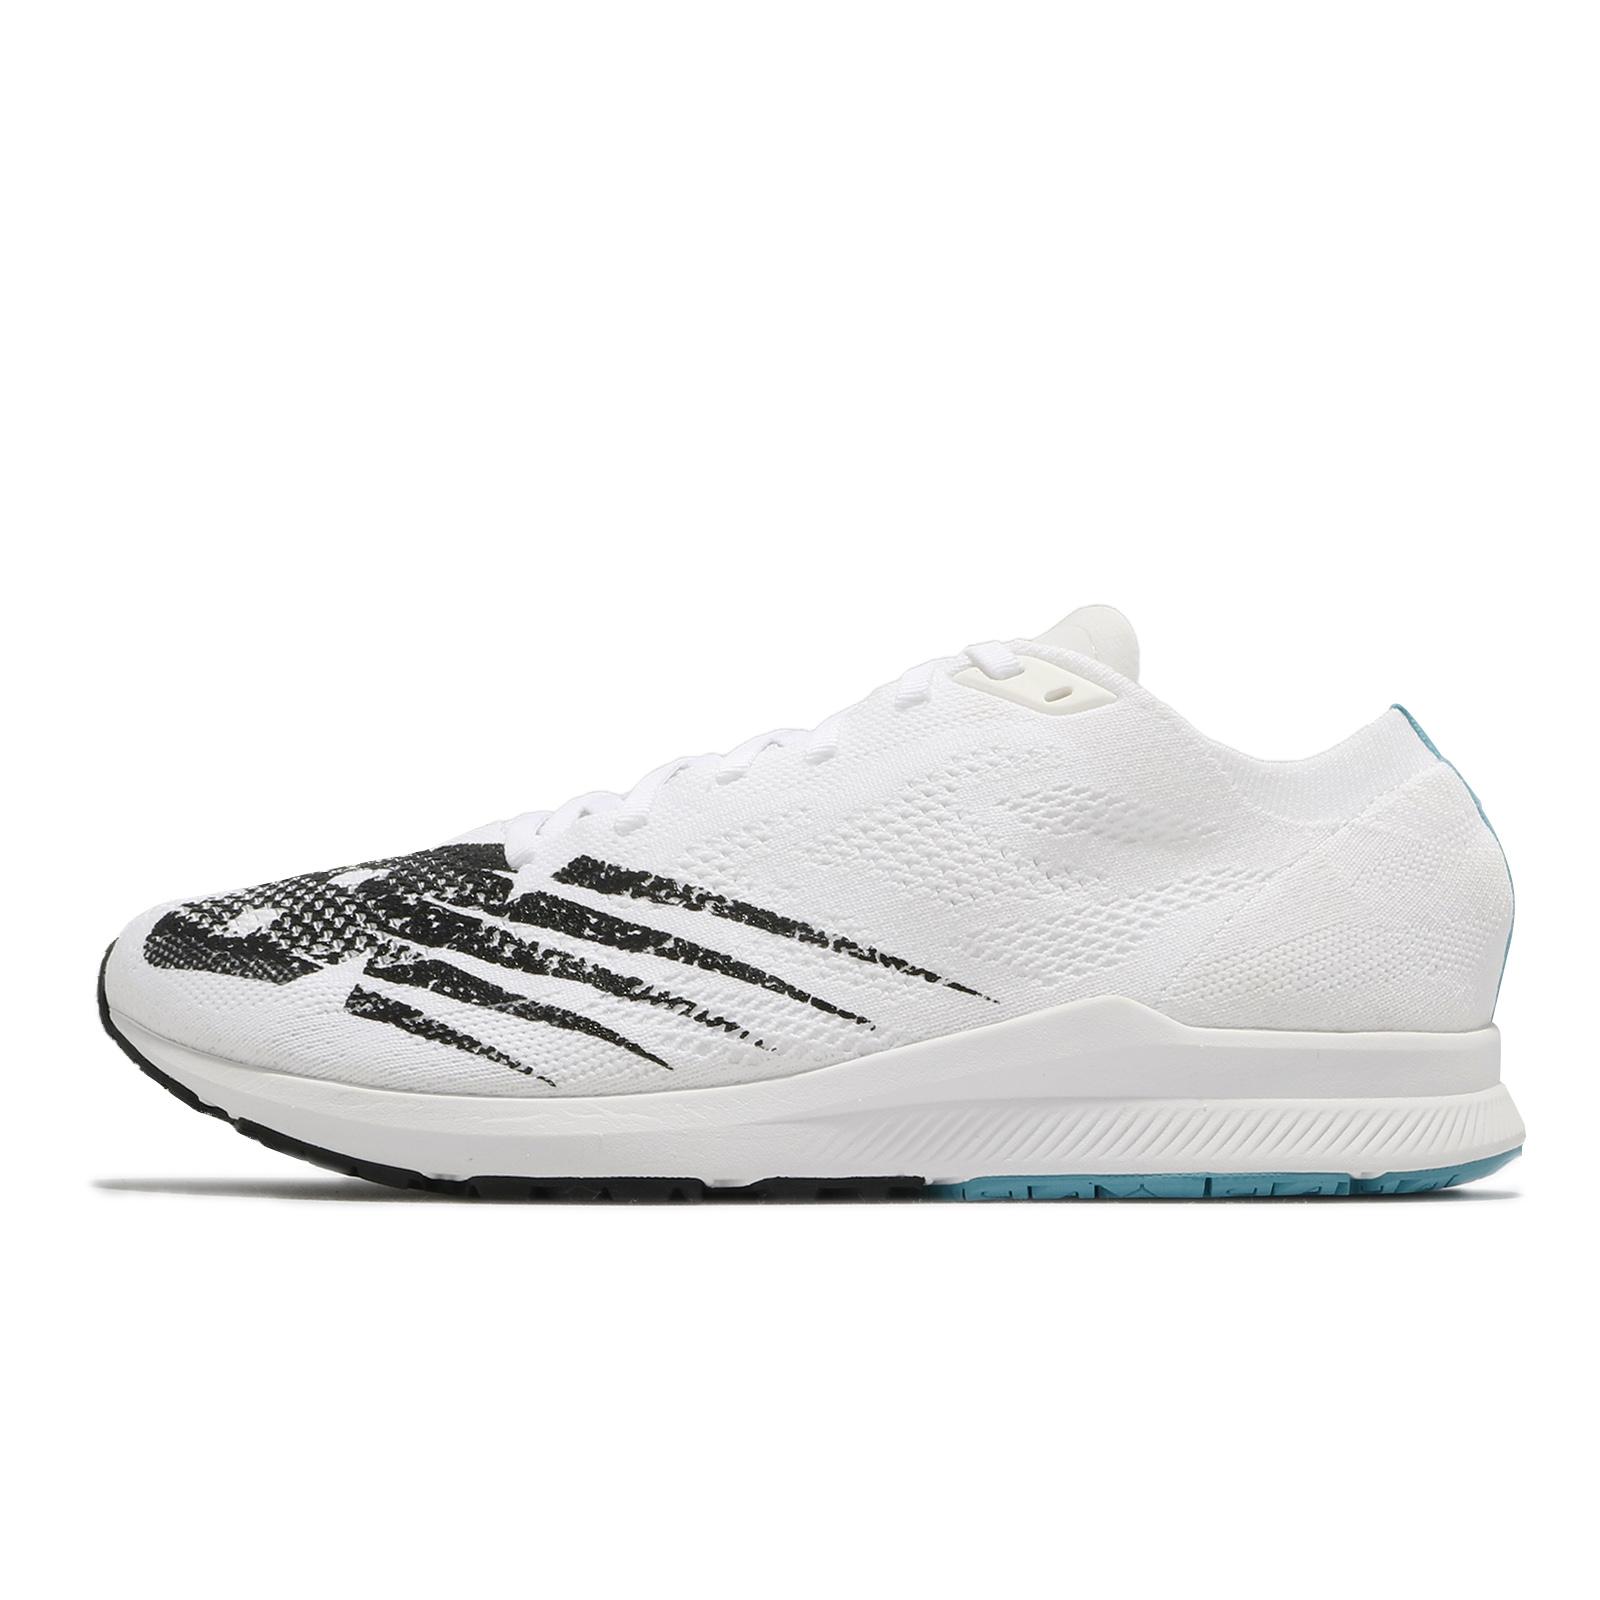 New Balance 慢跑鞋 1500 2E 寬楦 白 黑 藍 針織鞋面 男鞋 NB【ACS】 M1500CV6 2E